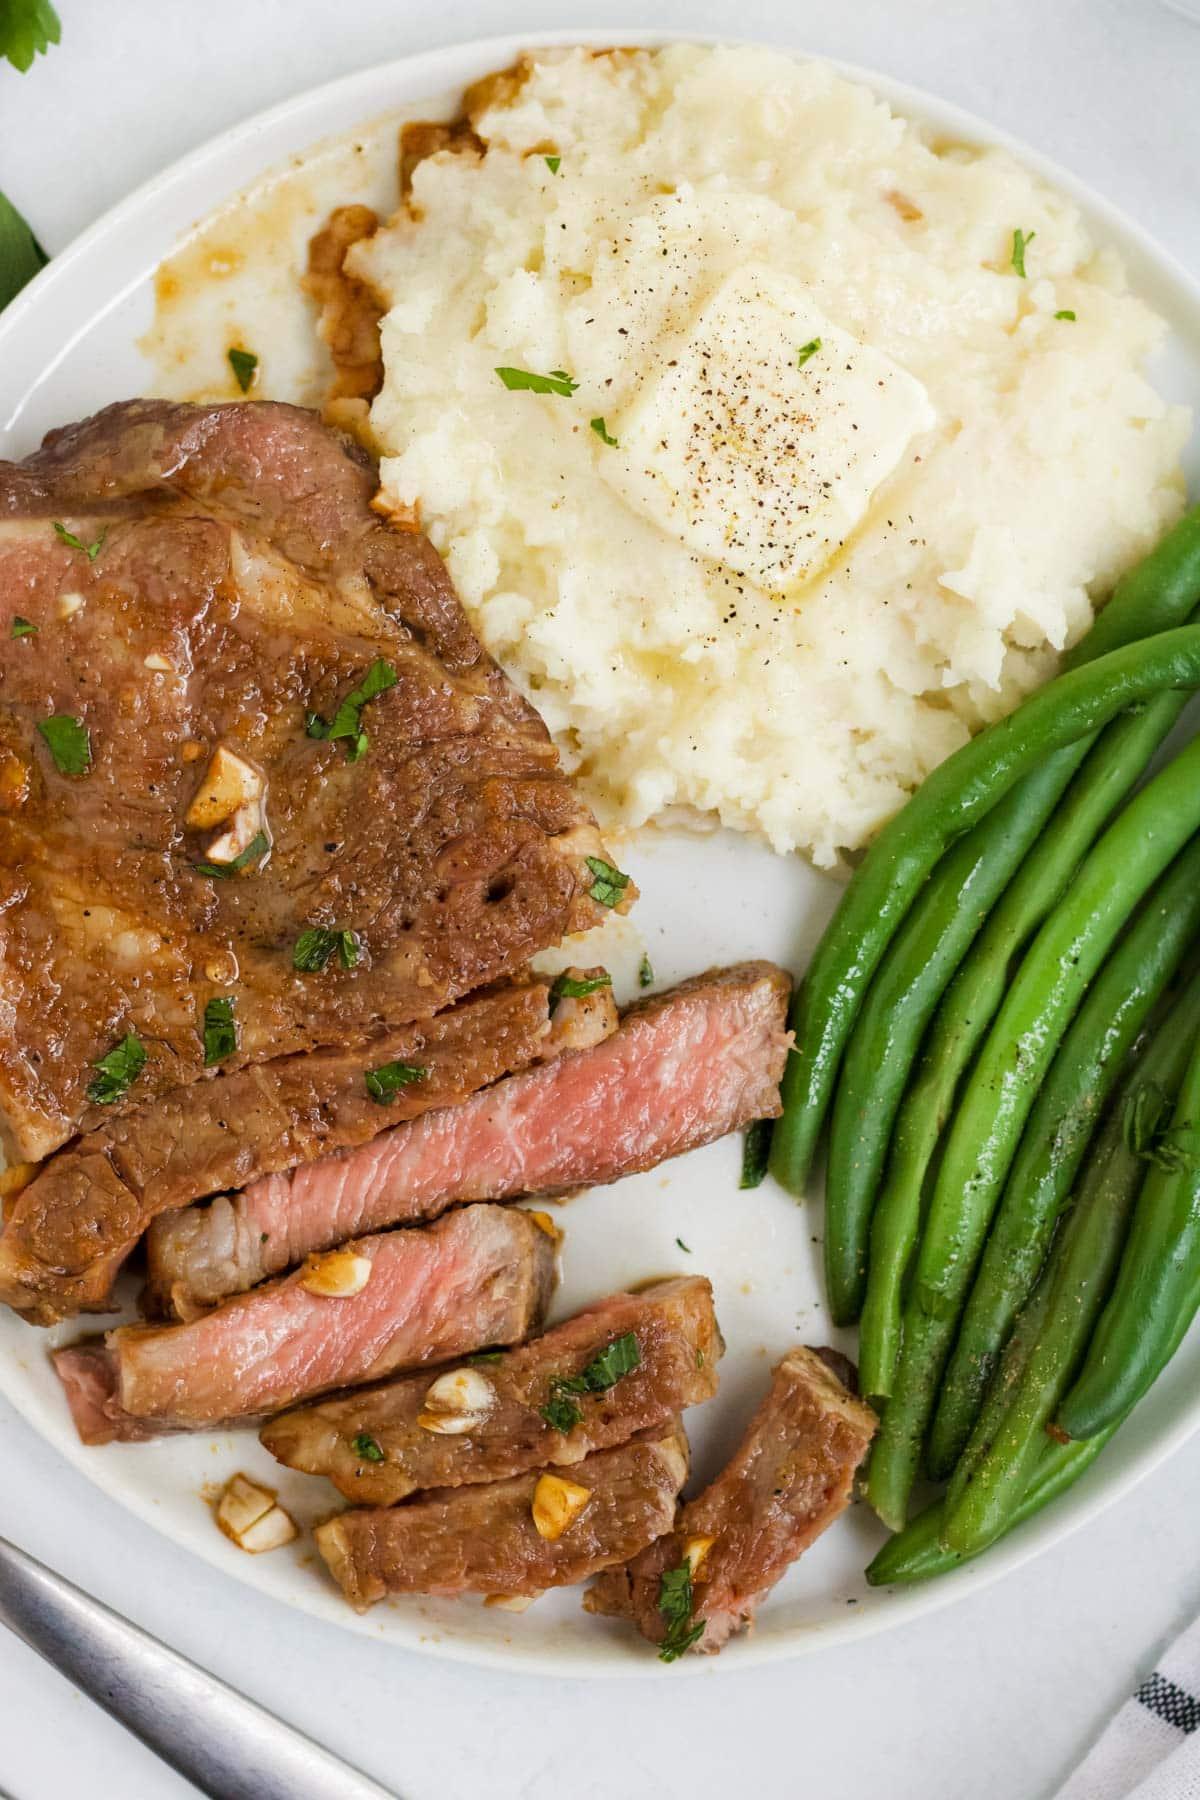 white plate, steak, green beans, mashed potatoes